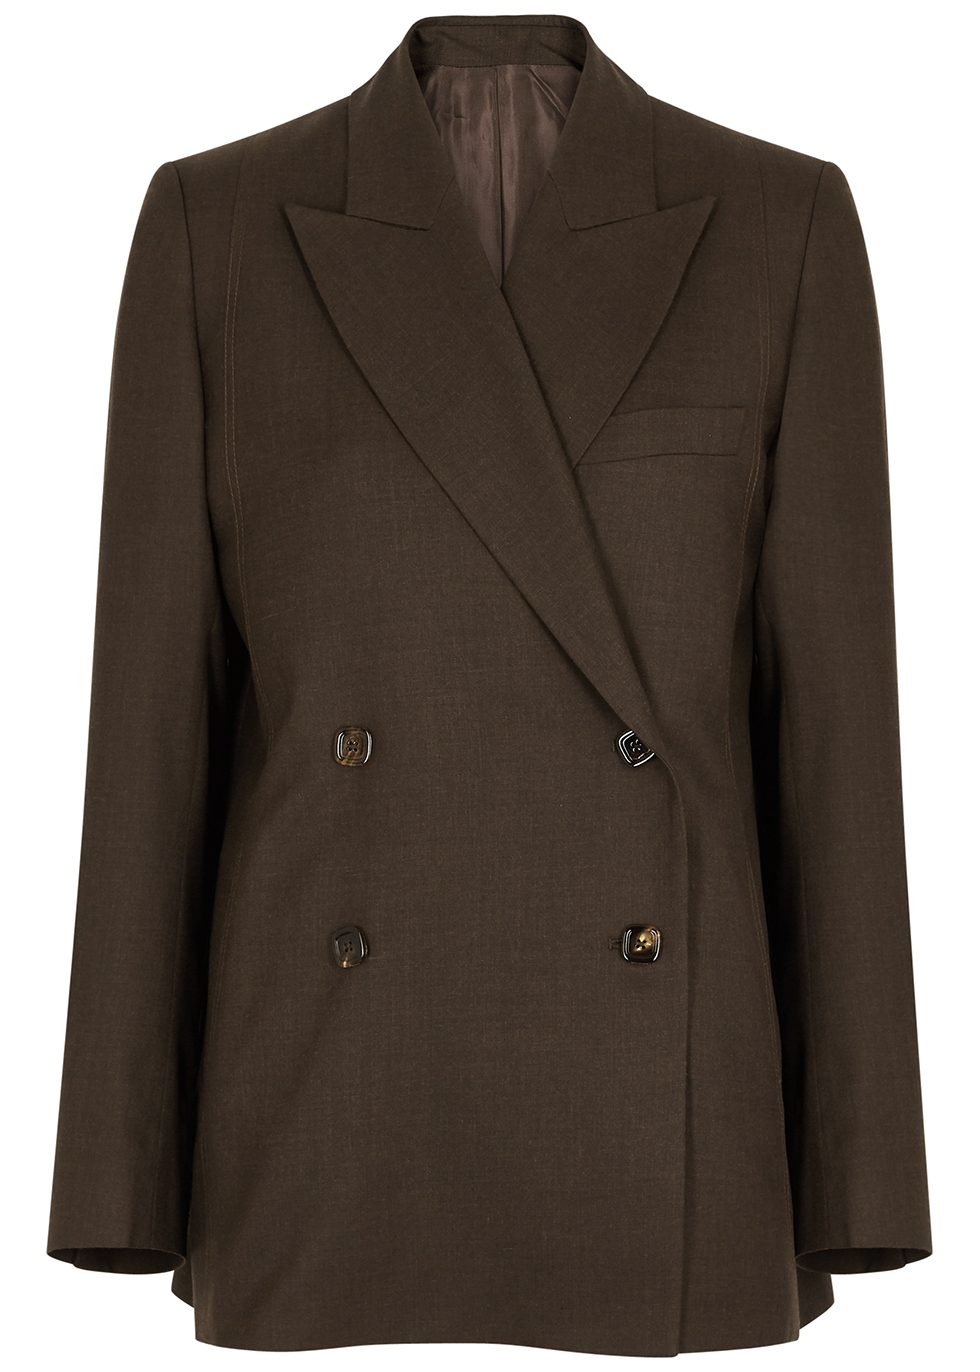 Dark brown double-breasted wool blazer